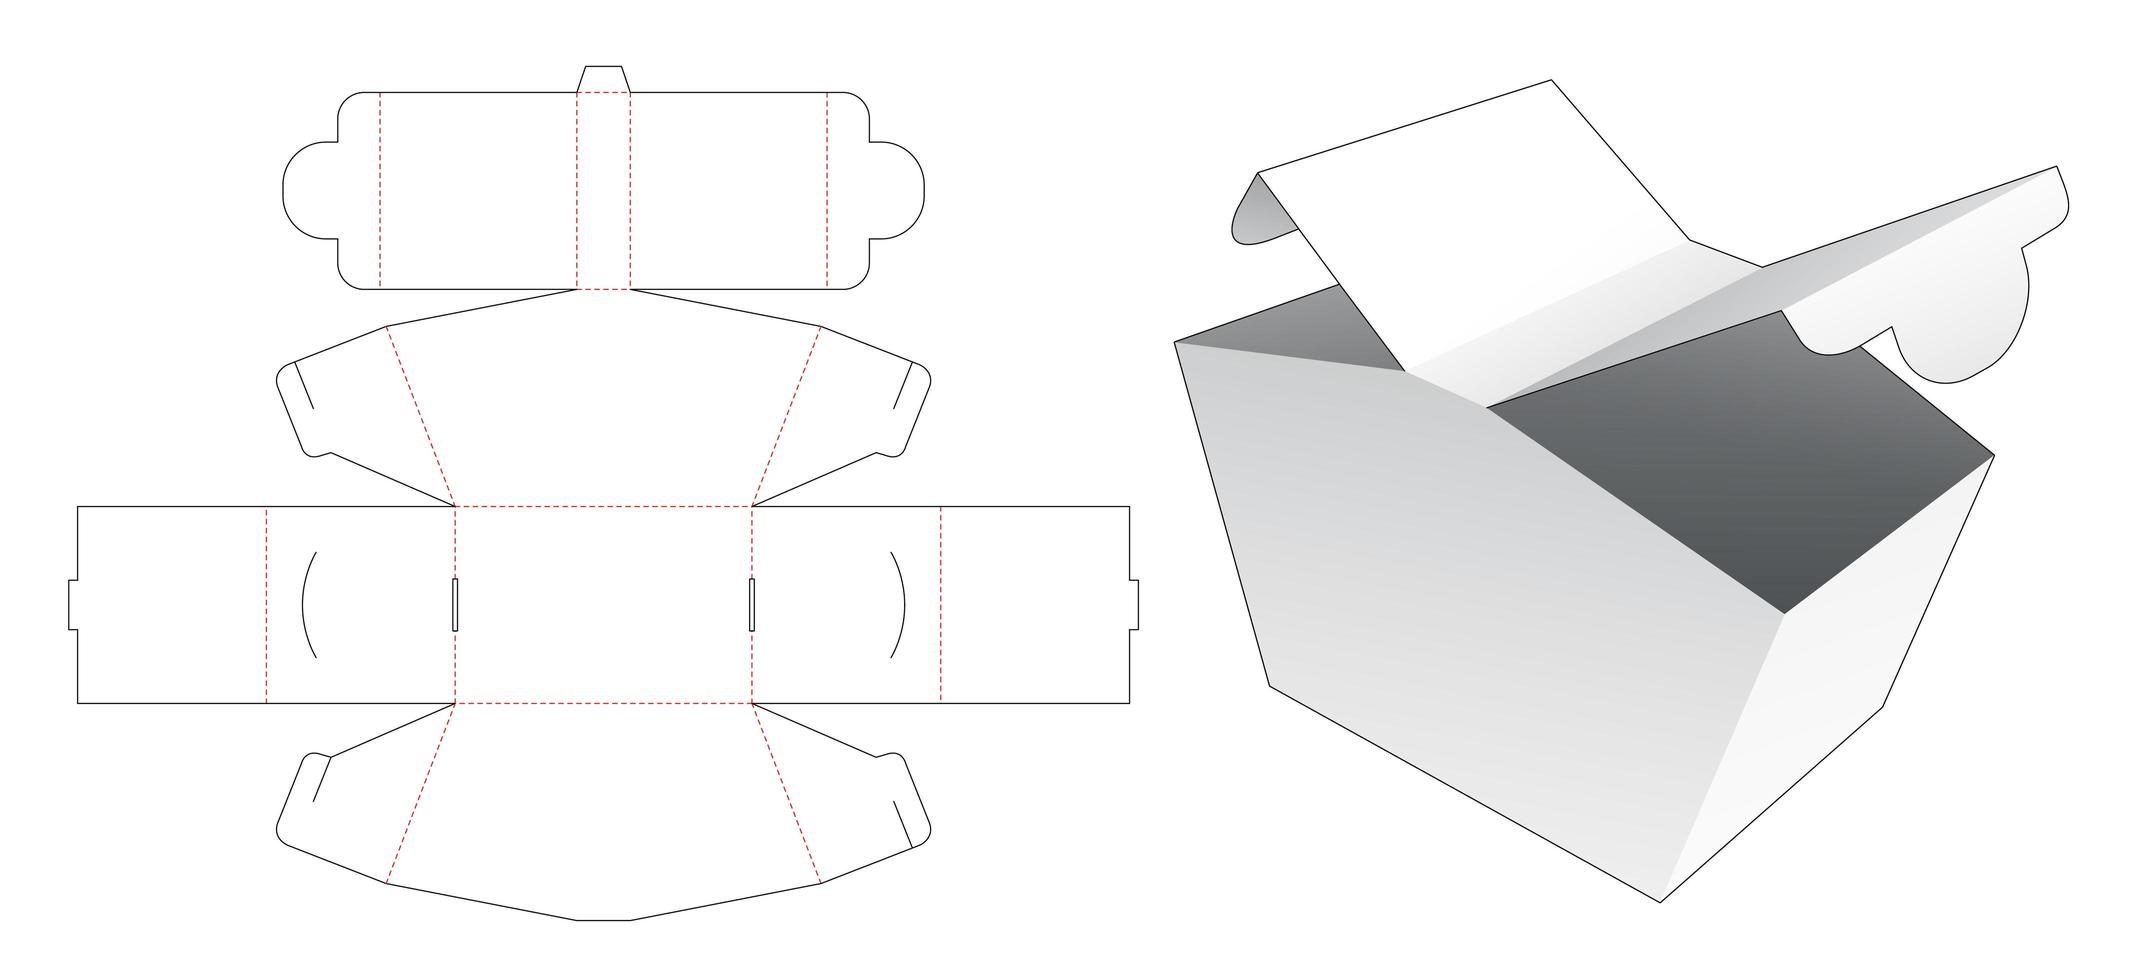 Caja de embalaje 2 puntos de apertura vector